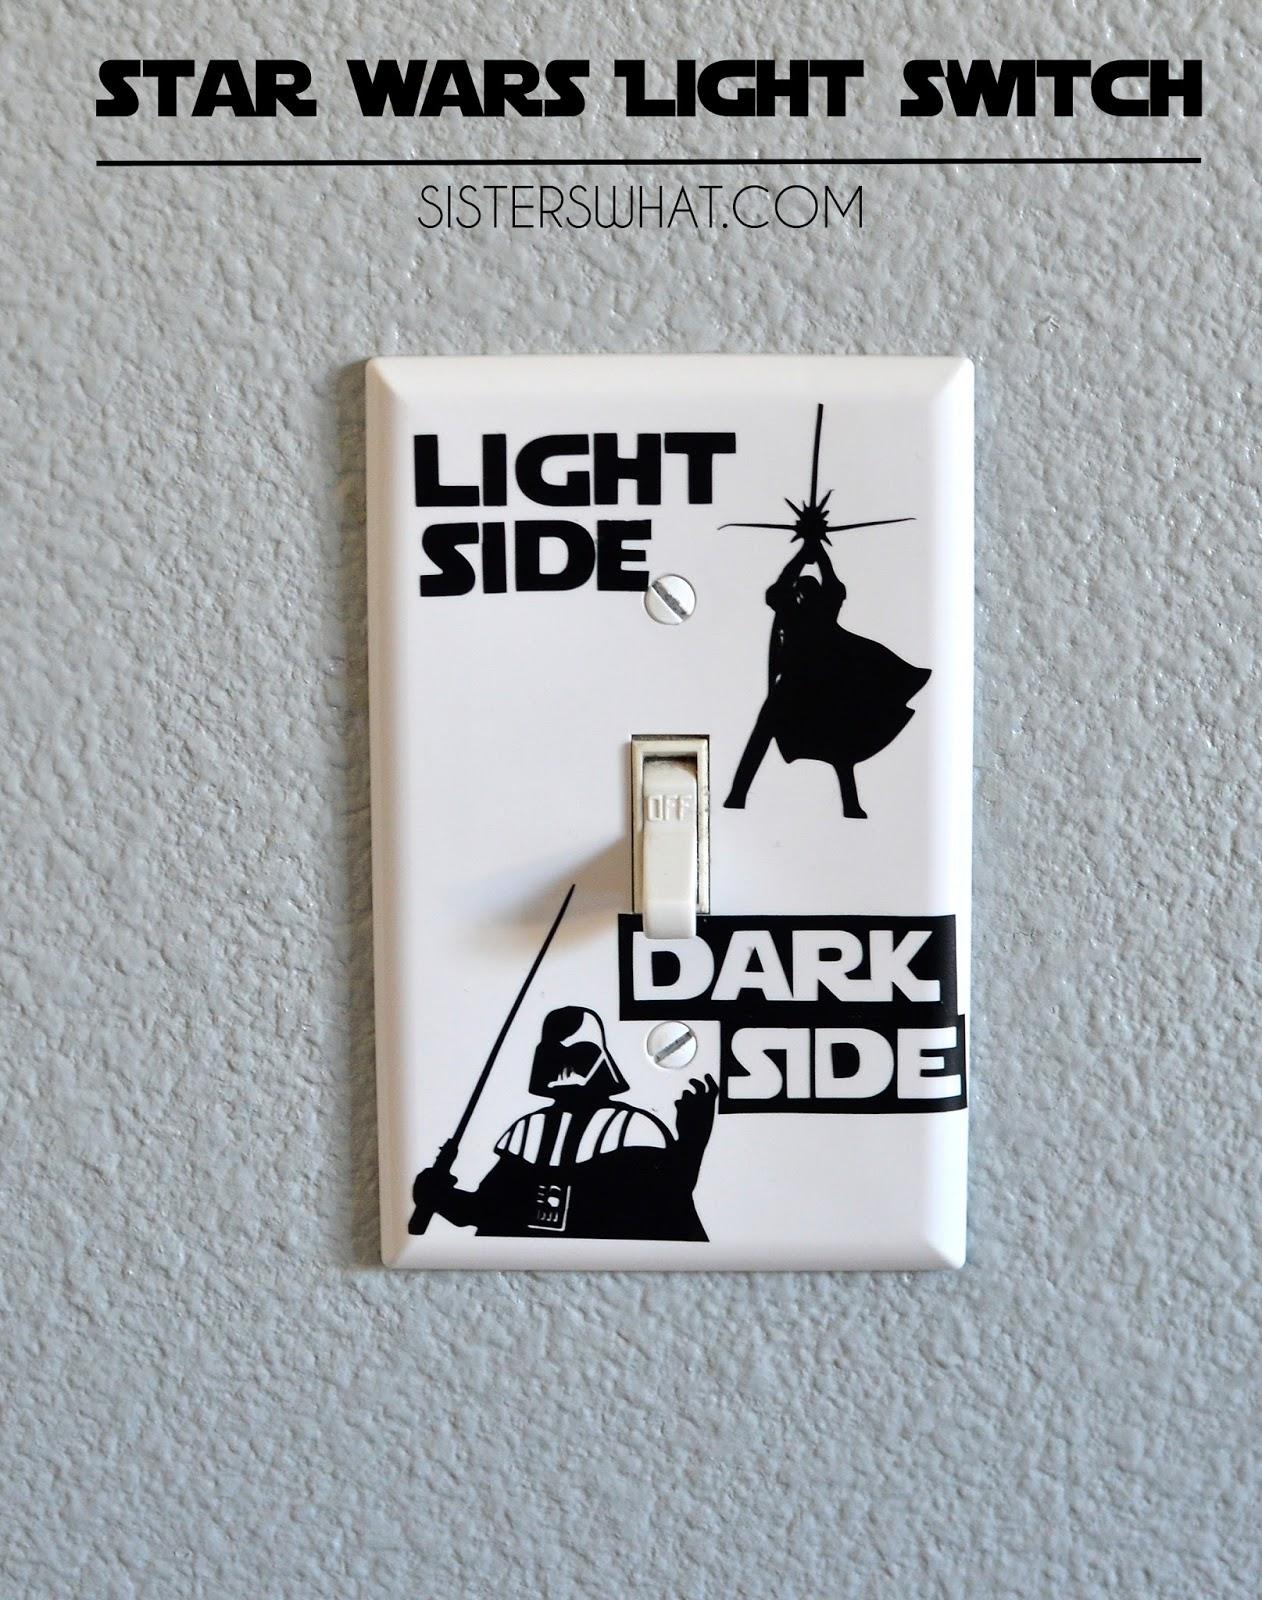 Star Wars Light Switch